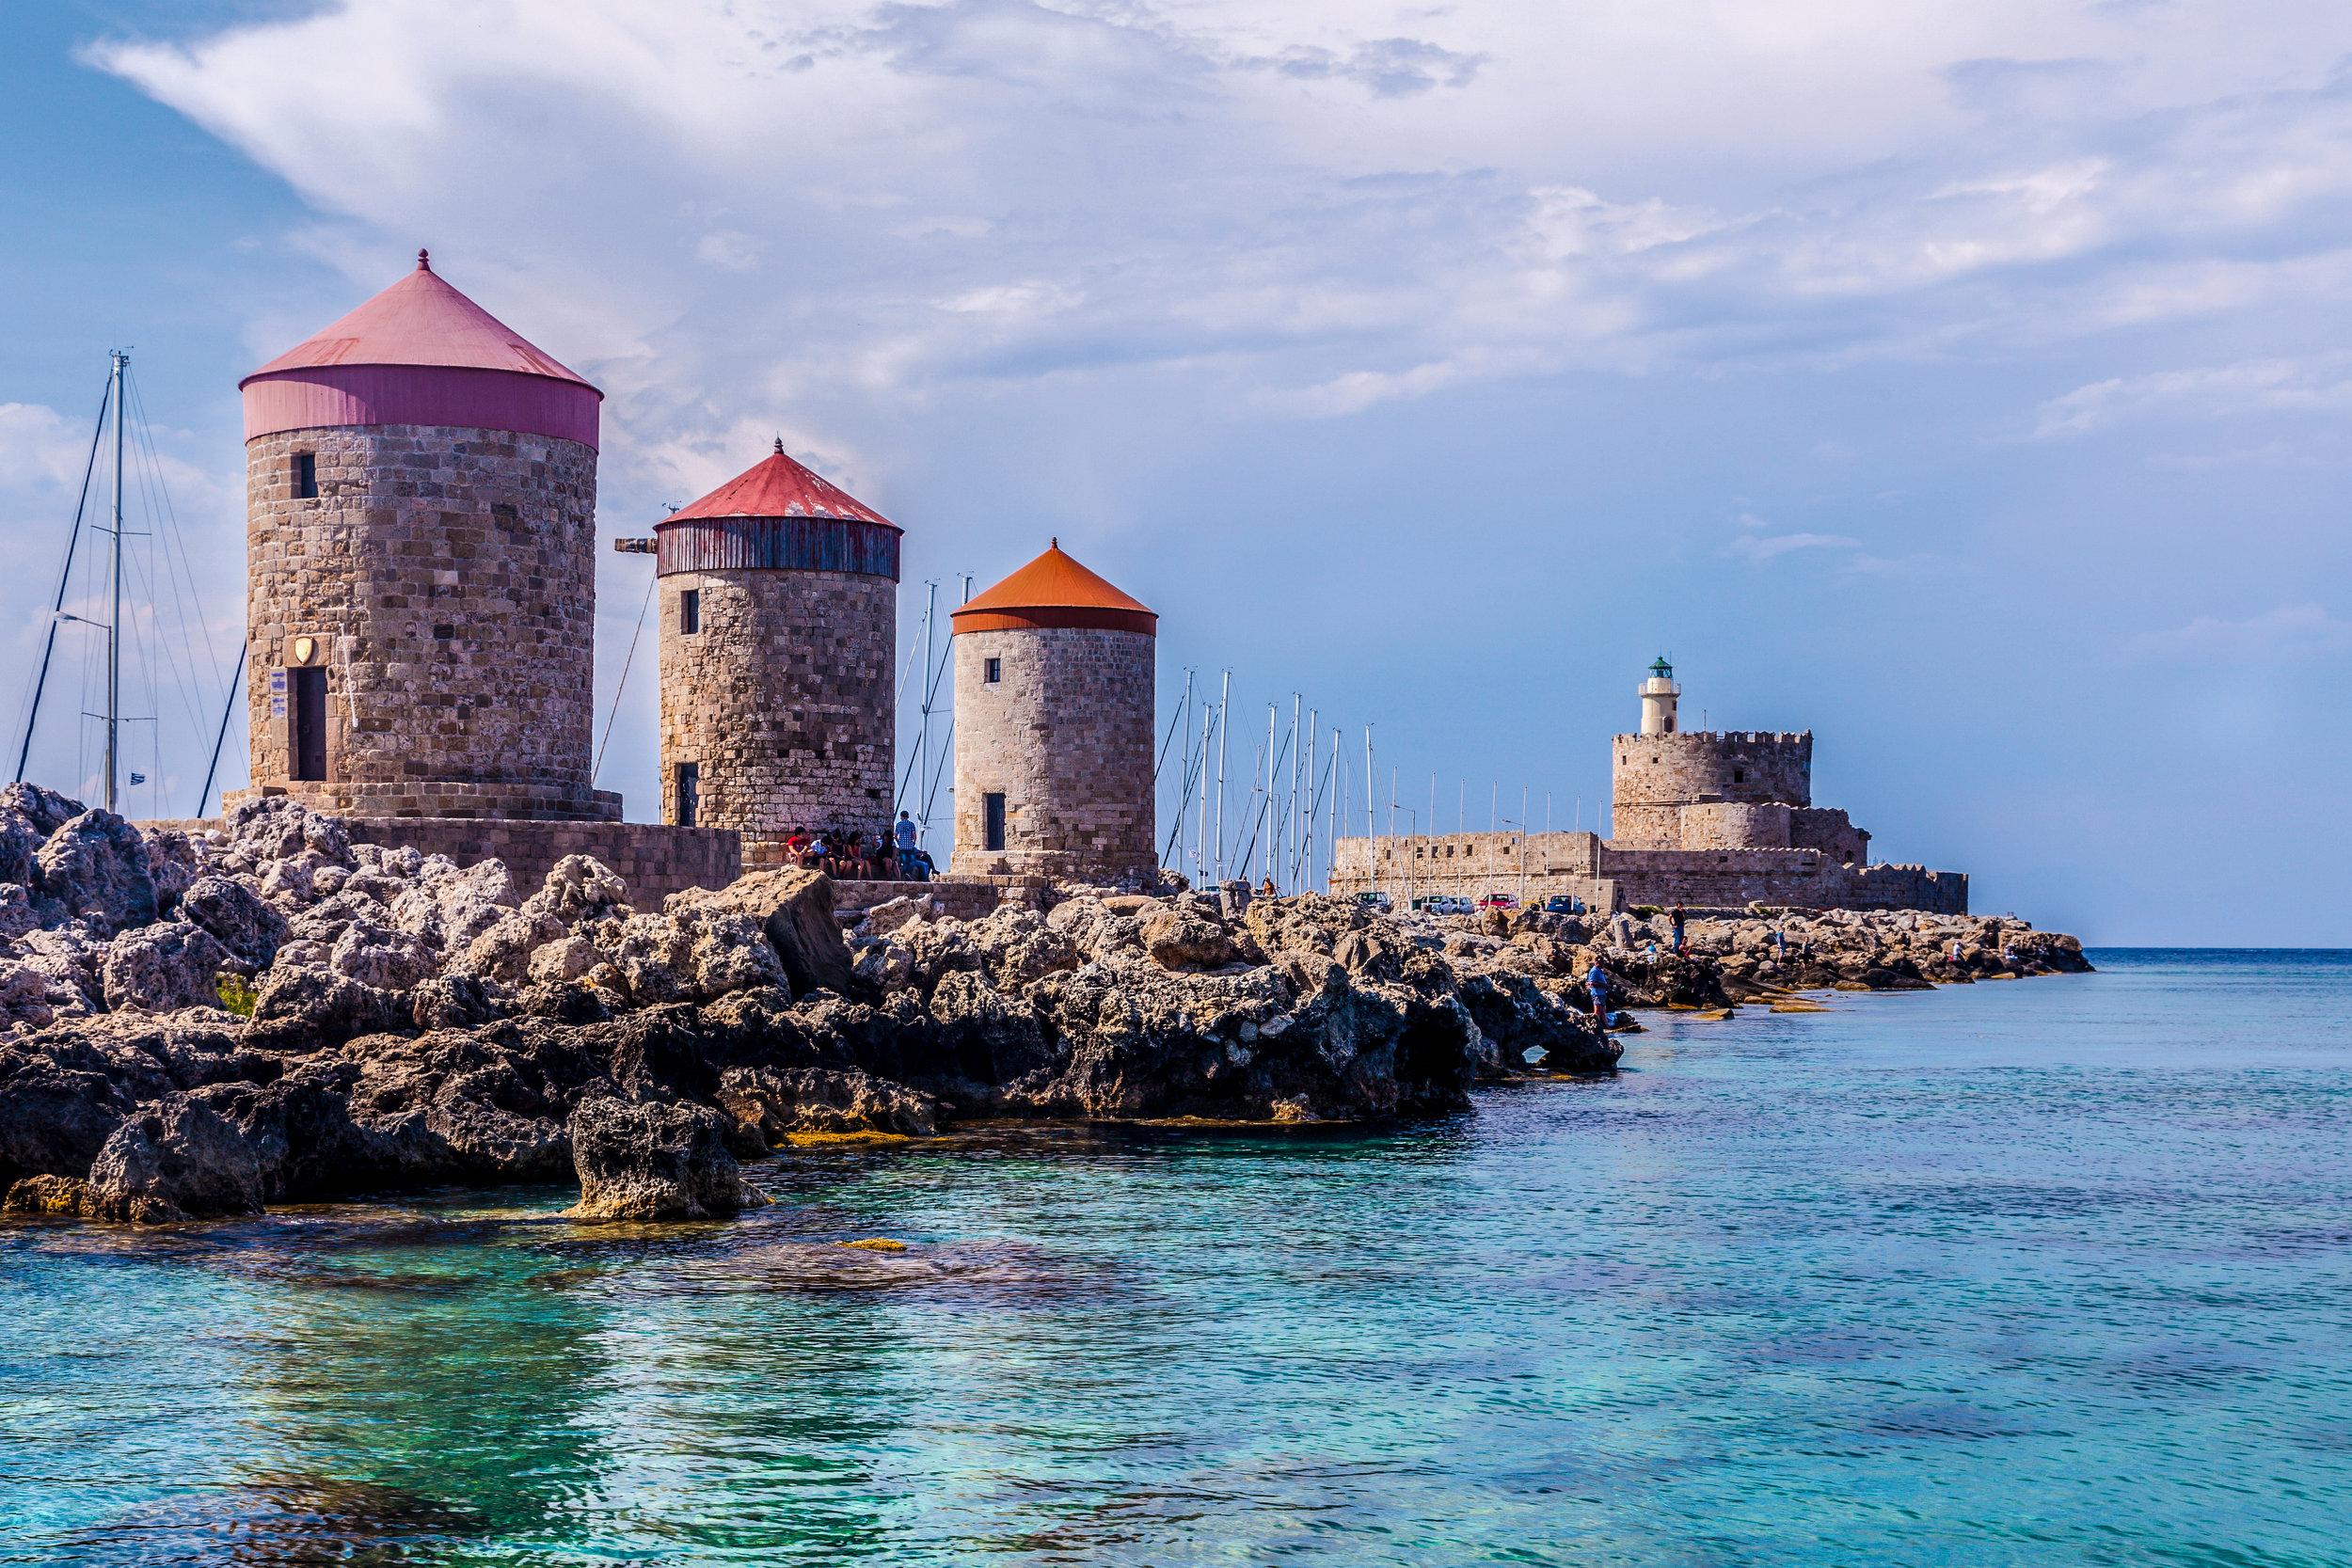 A Knights' Island - Leisurely walking on the Greek Island of RhodesFrom £1135